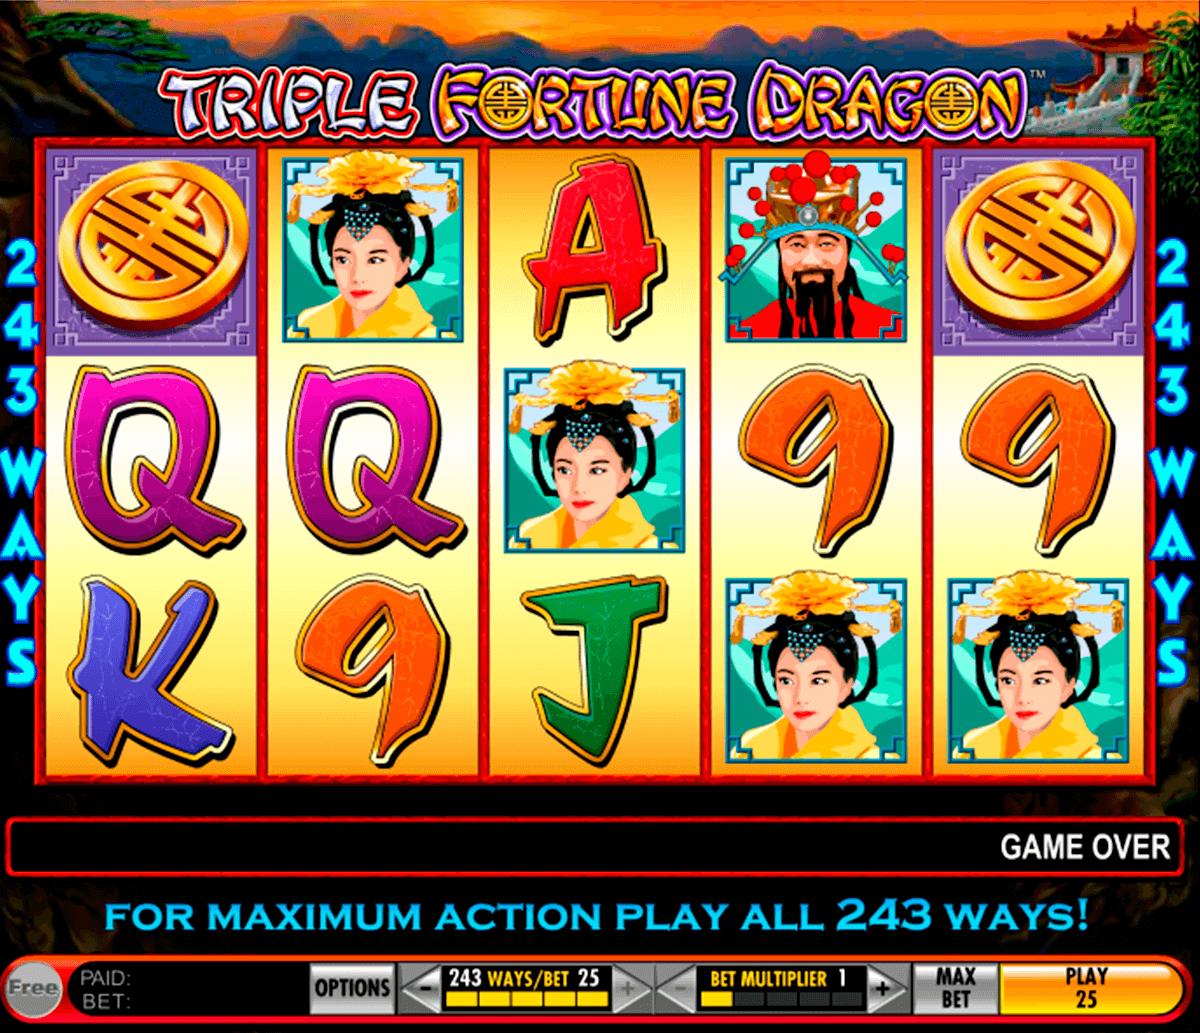 triple fortune dragon igt slot